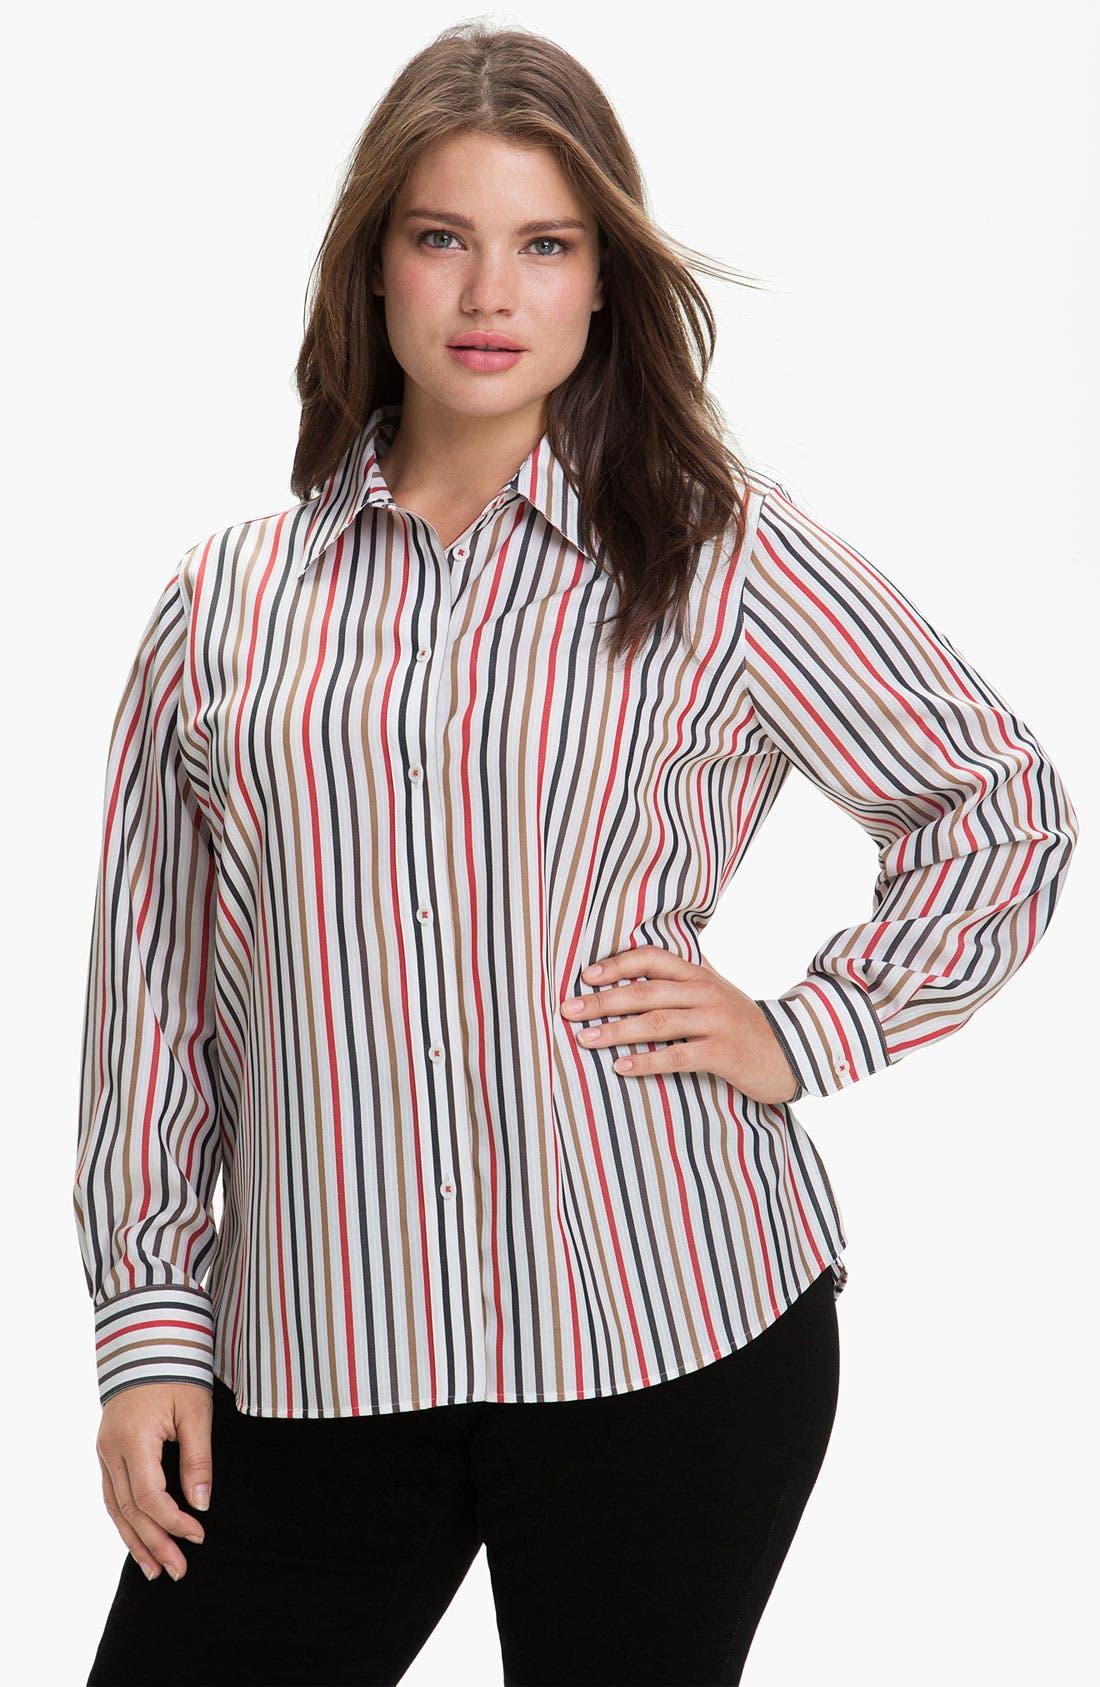 Alternate Image 1 Selected - Foxcroft 'Autumn Stripe' Wrinkle Free Shaped Shirt (Plus)